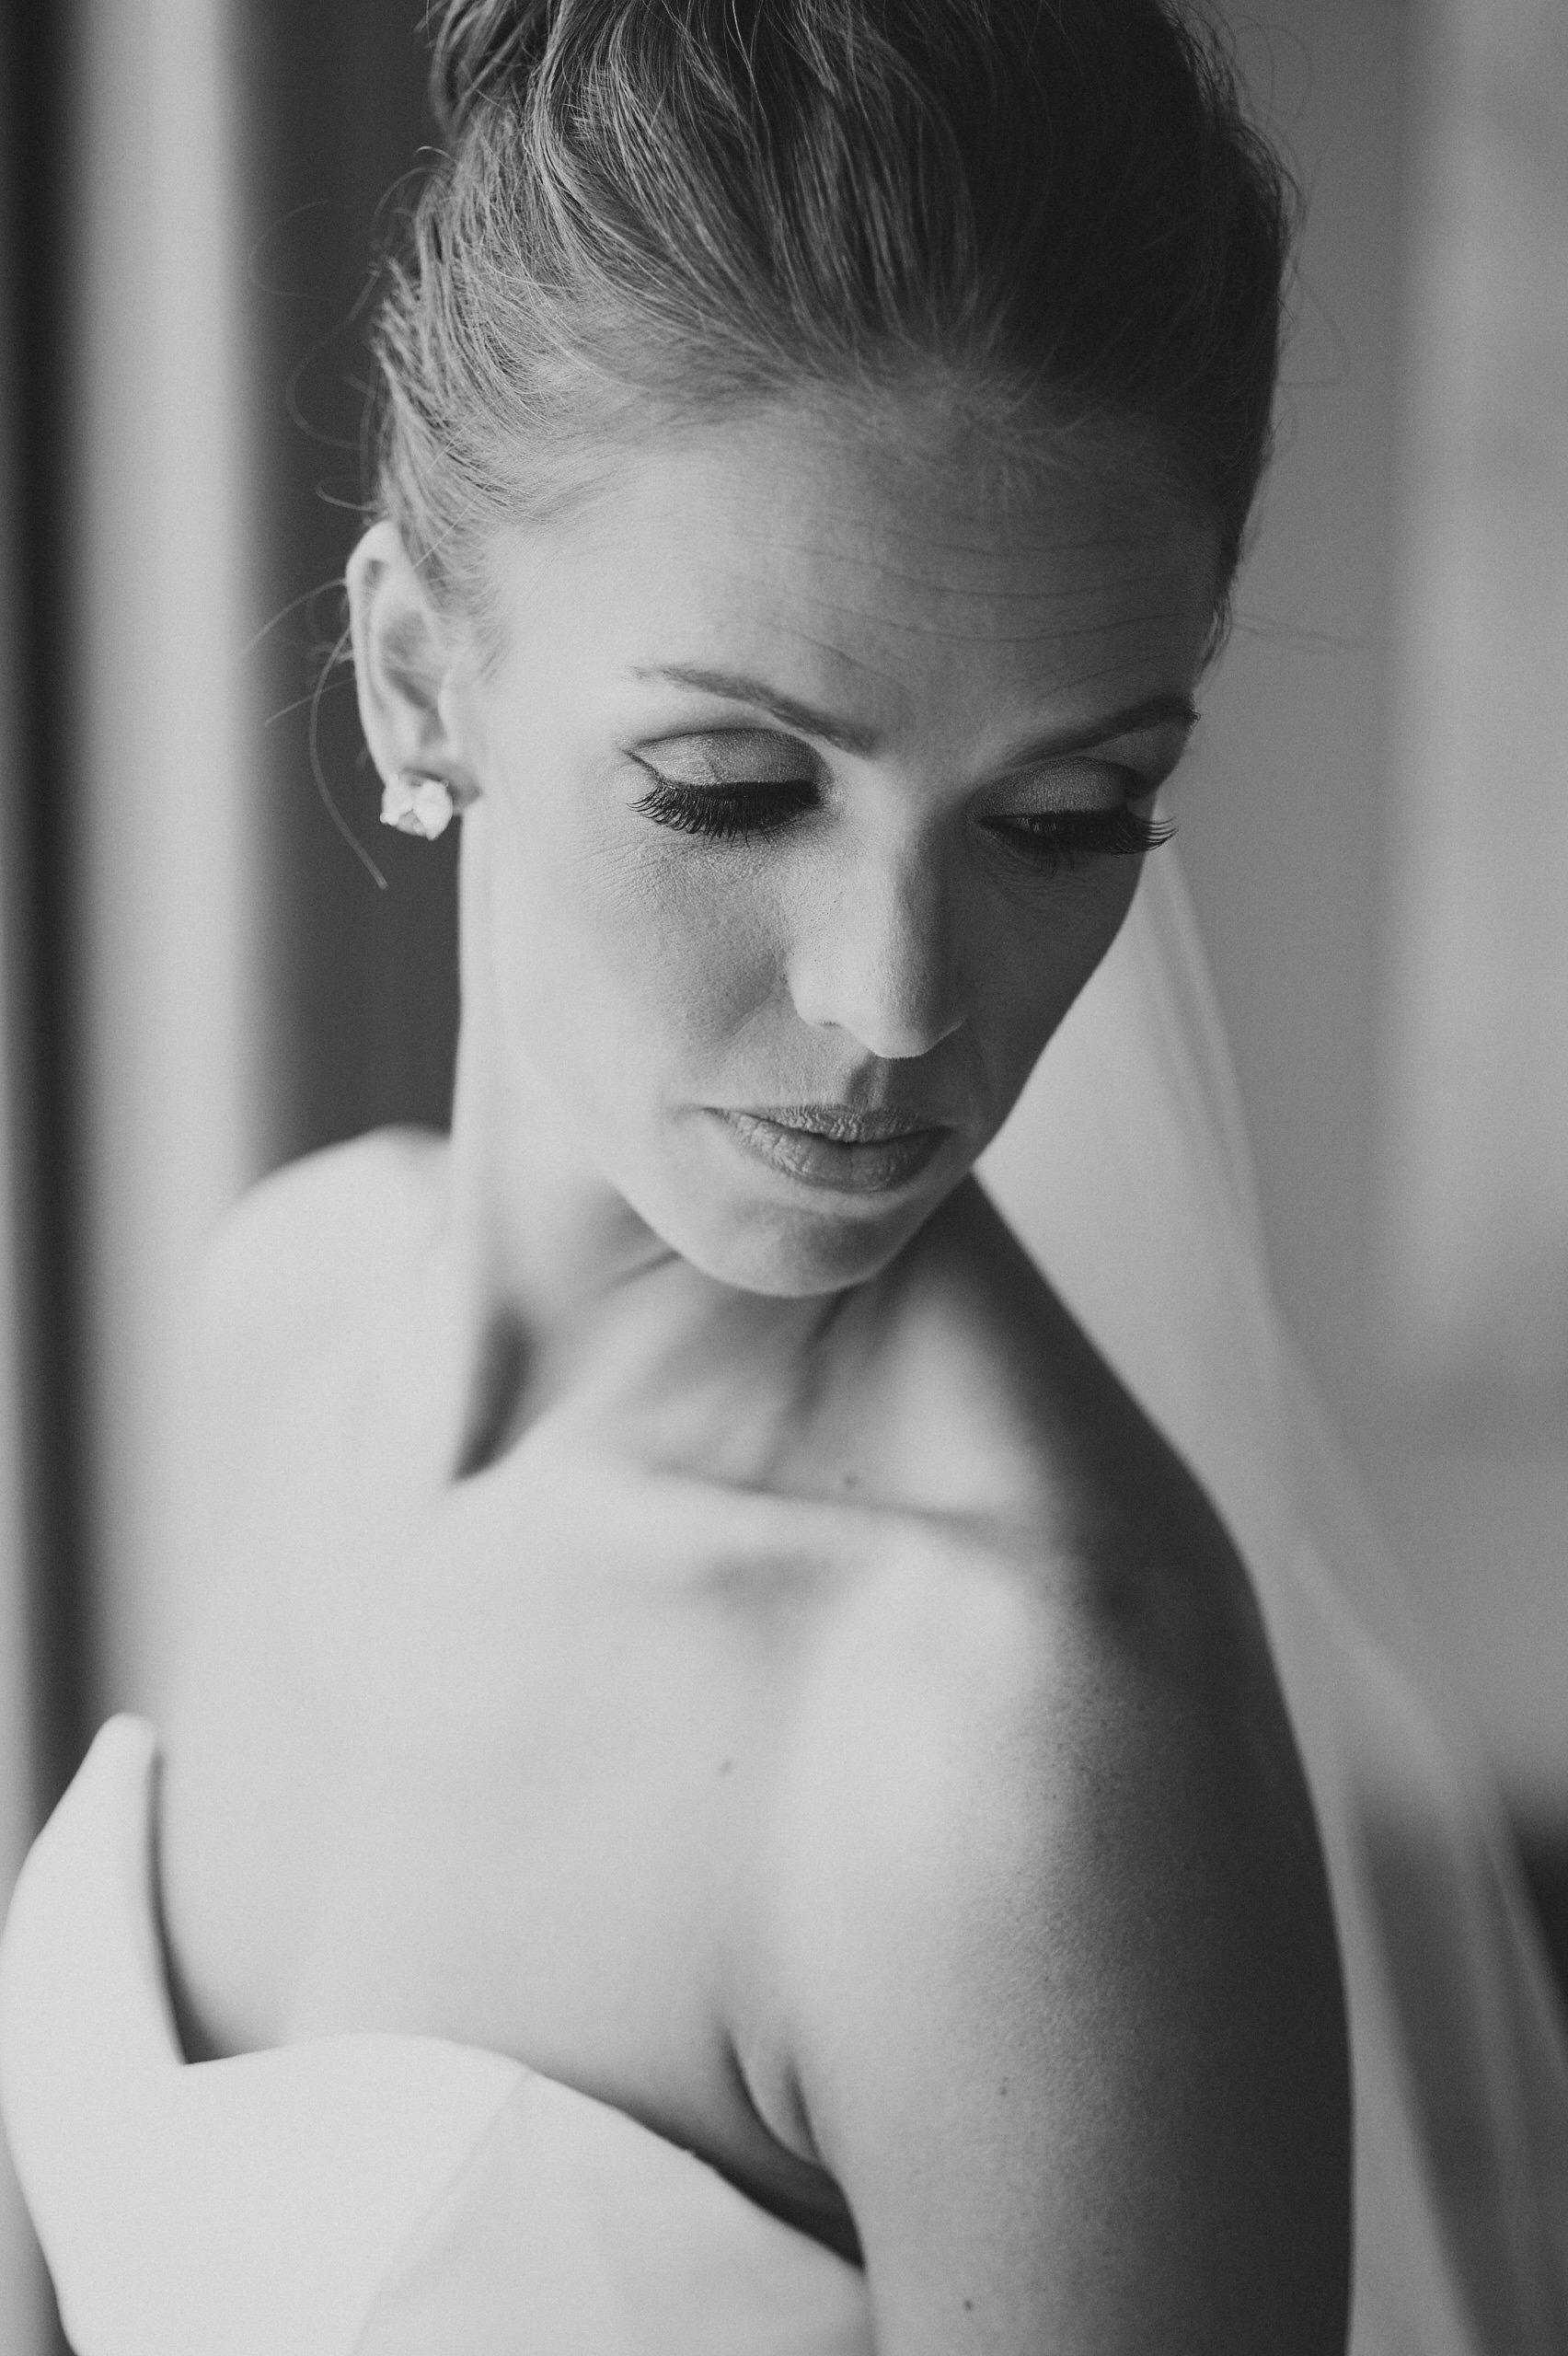 shelby&jordan|smitten&hooked|wedding|groups-013.jpg